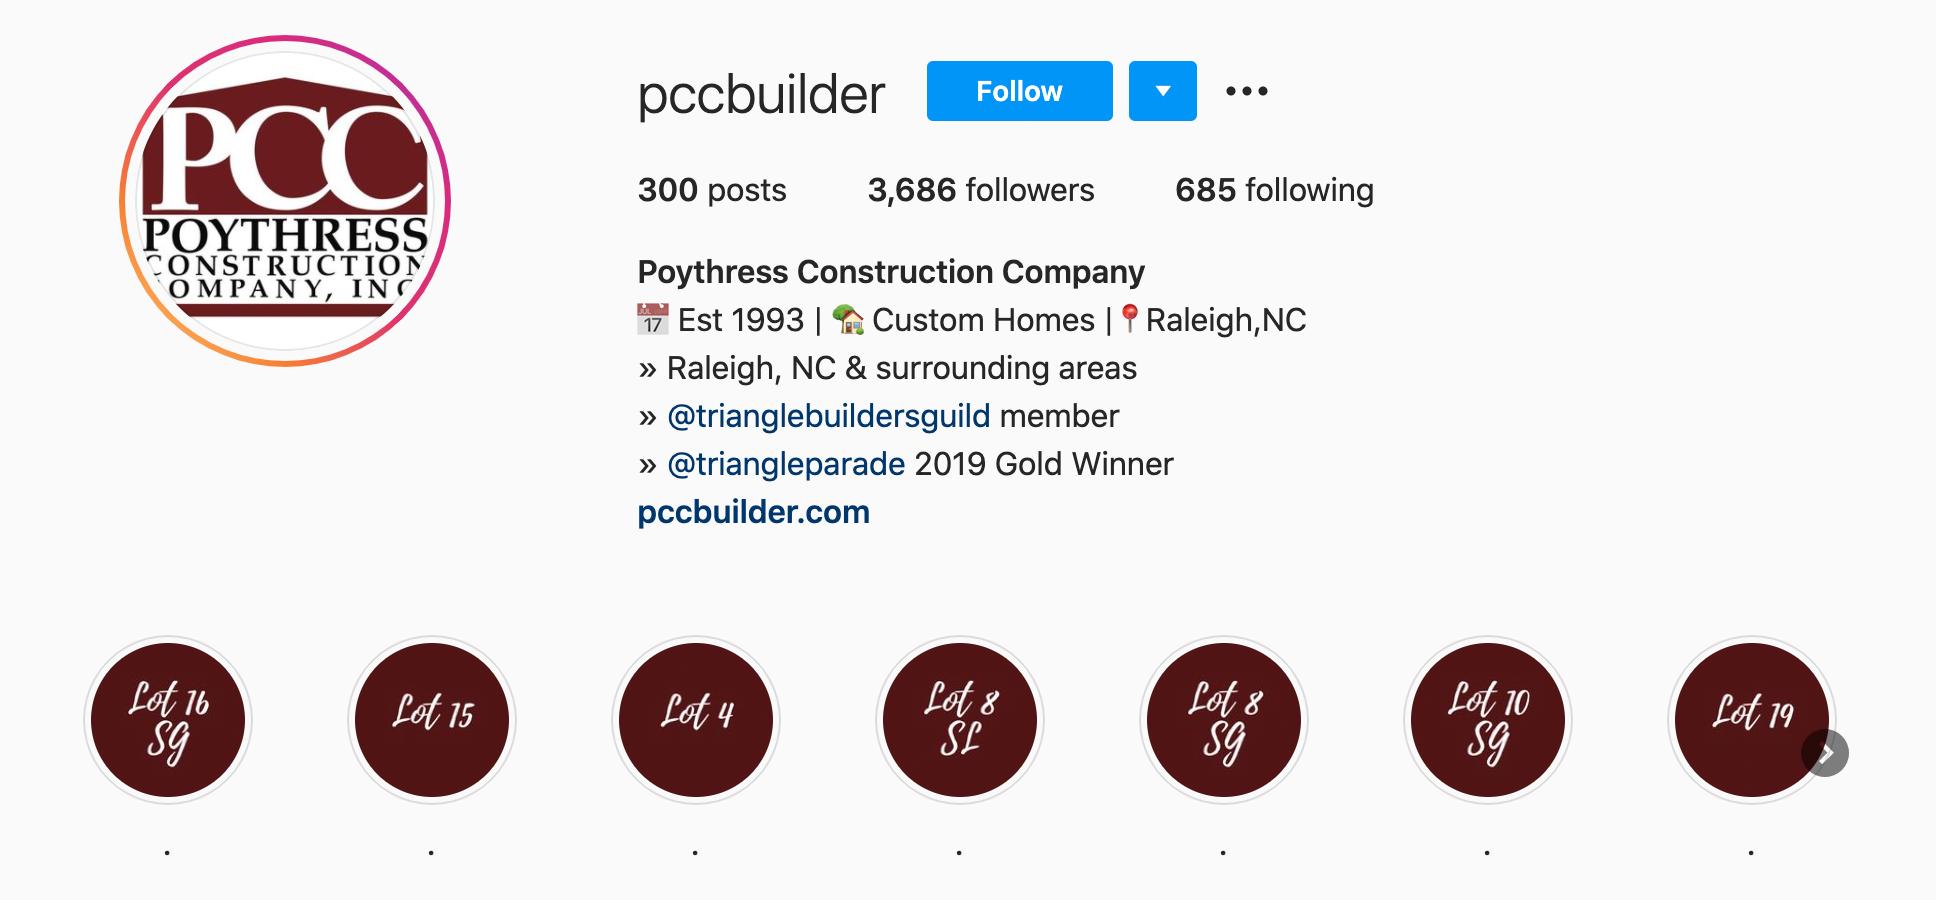 pccbuilders-instagram-profile